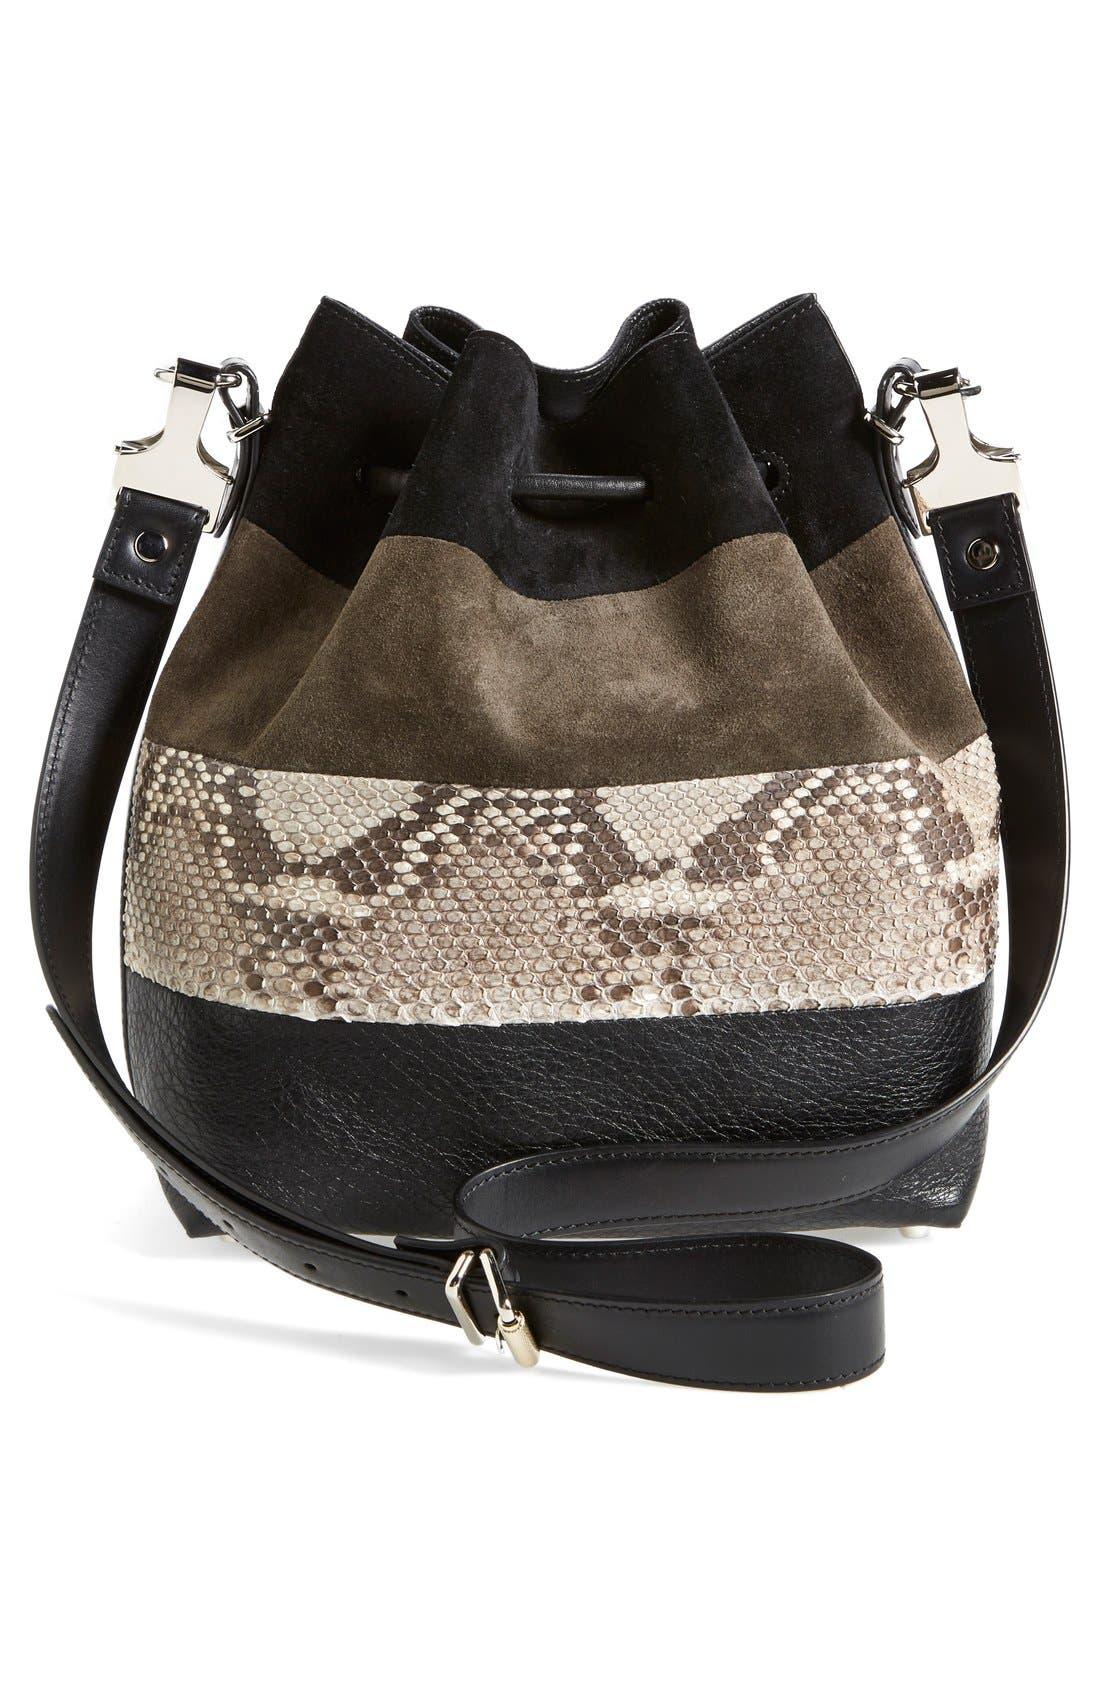 Alternate Image 3  - Proenza Schouler 'Medium' Suede & Genuine Snakeskin Bucket Bag